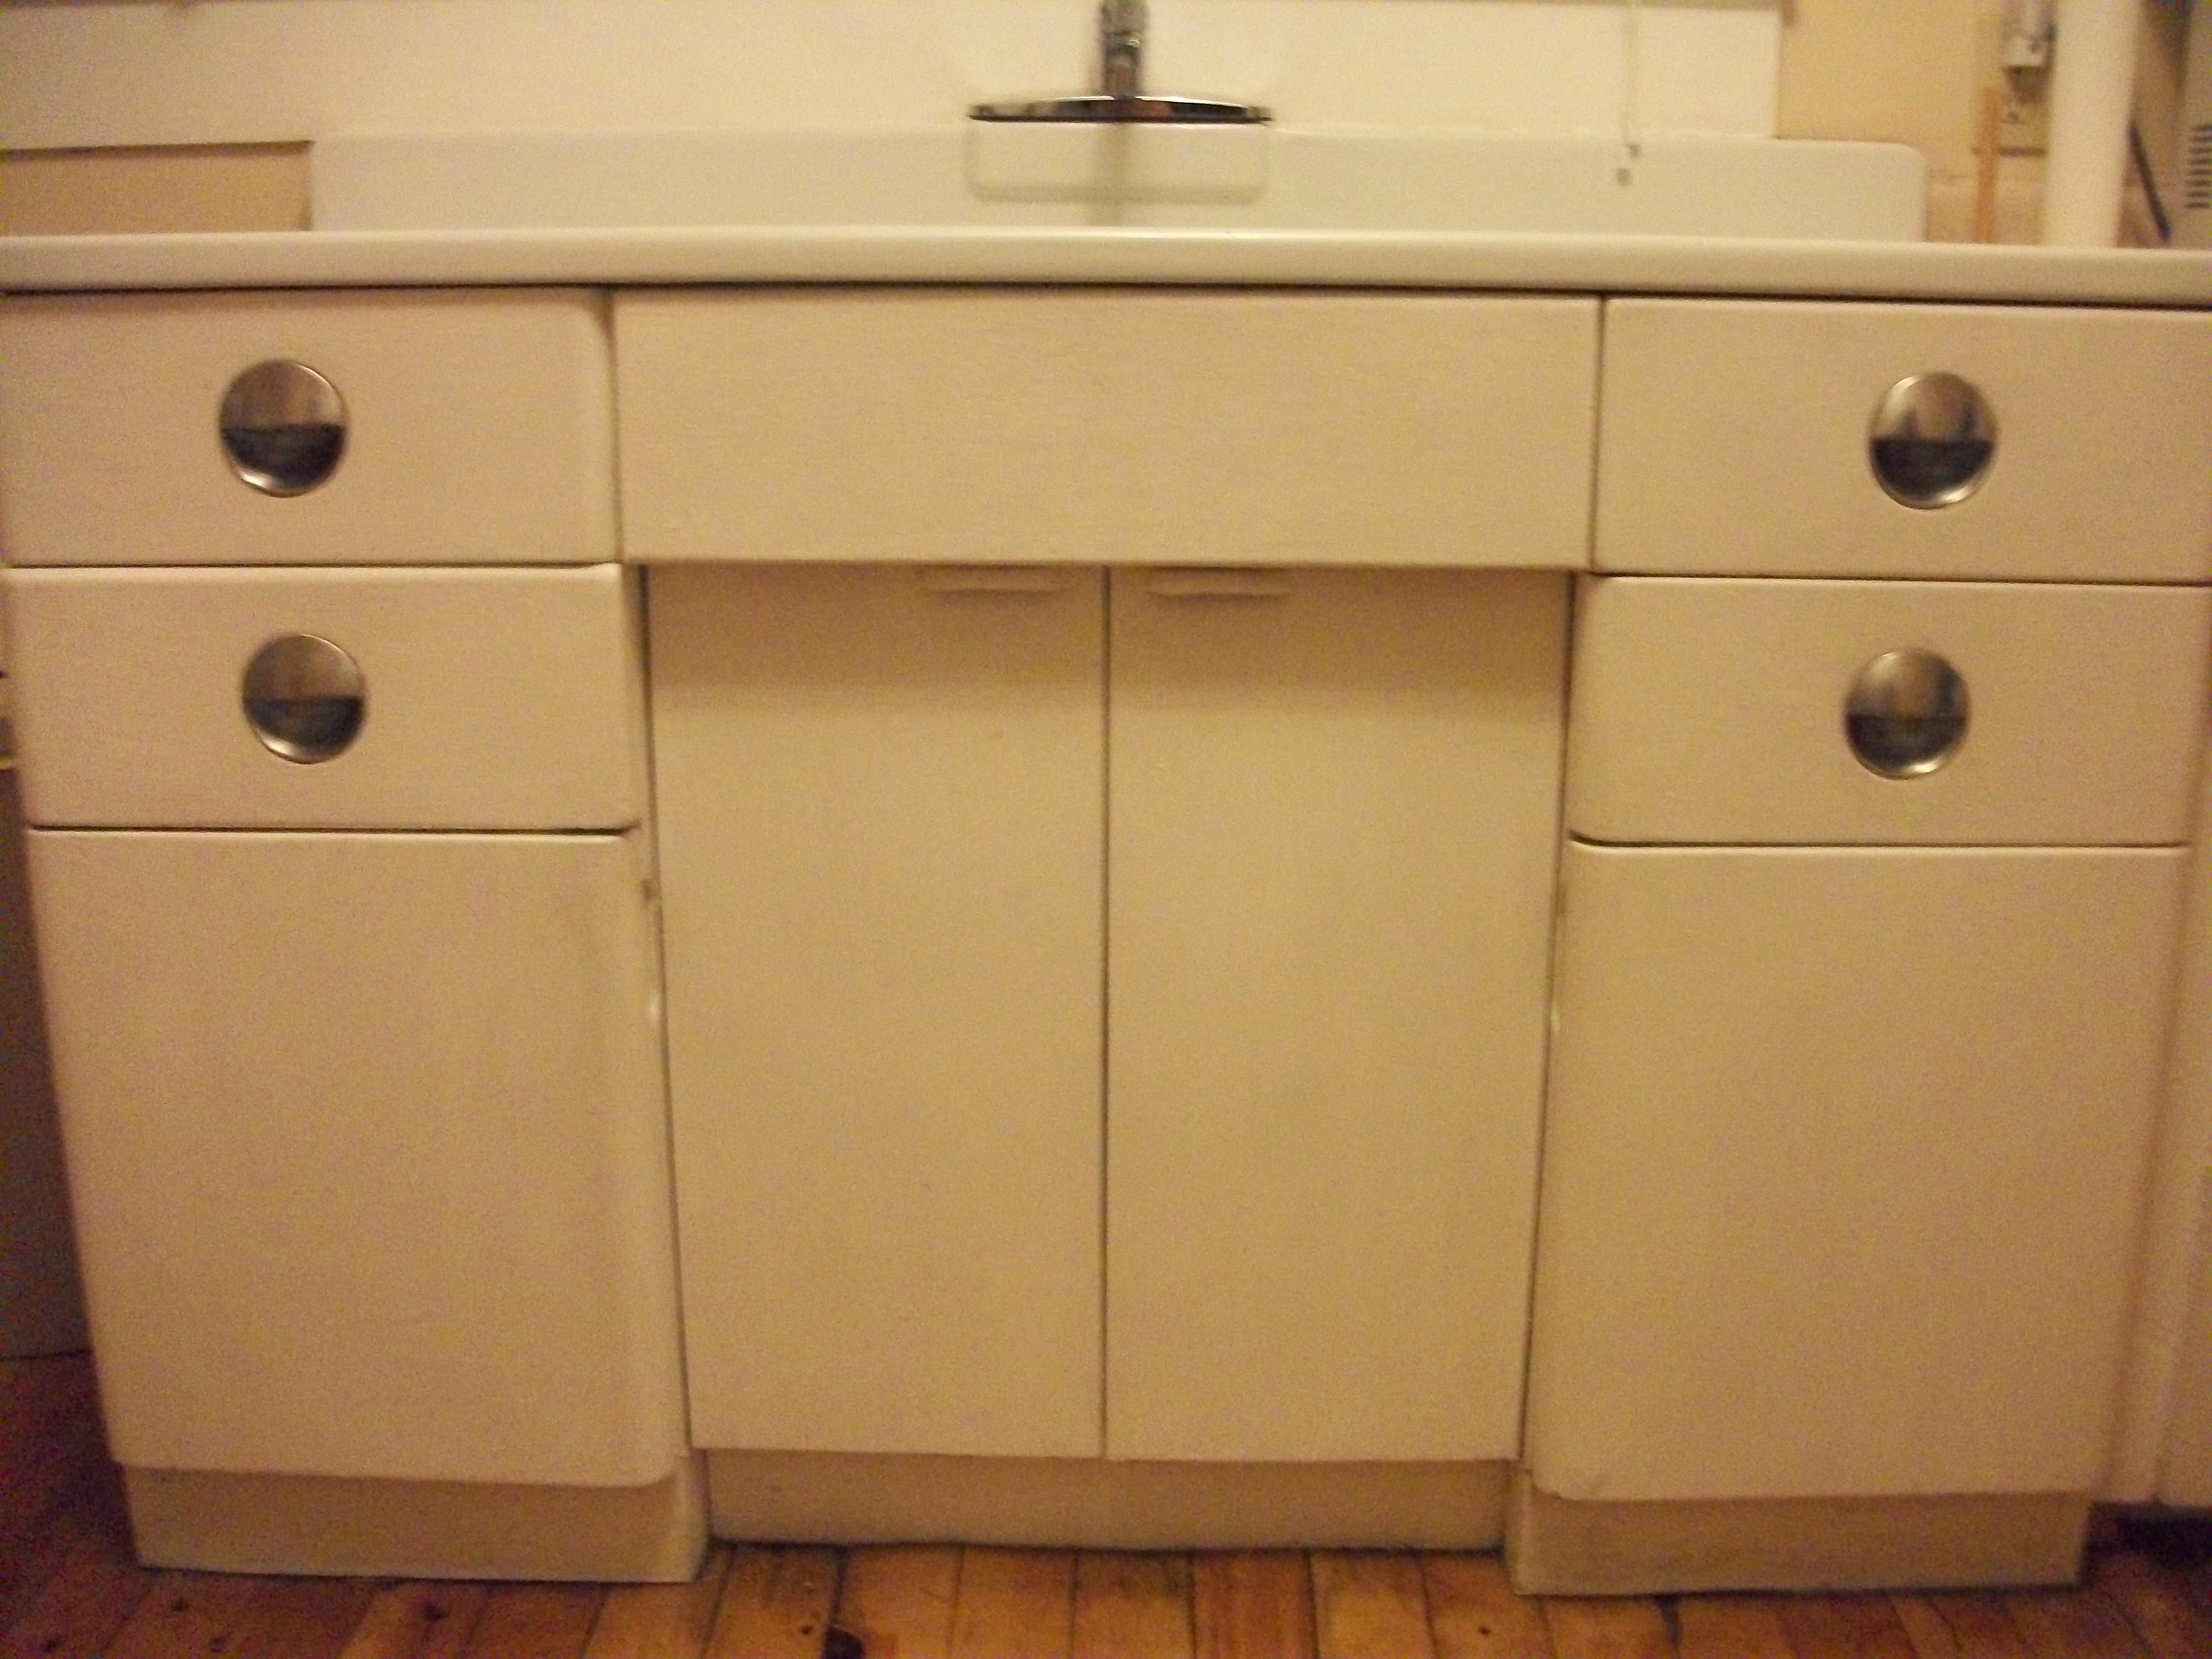 Antique Metal Kitchen Cabinet and Porcelain Sink sears kitchen cabinets Metal Kitchen Cabinet and Porcelain Sink For Sale Antiques com Classifieds